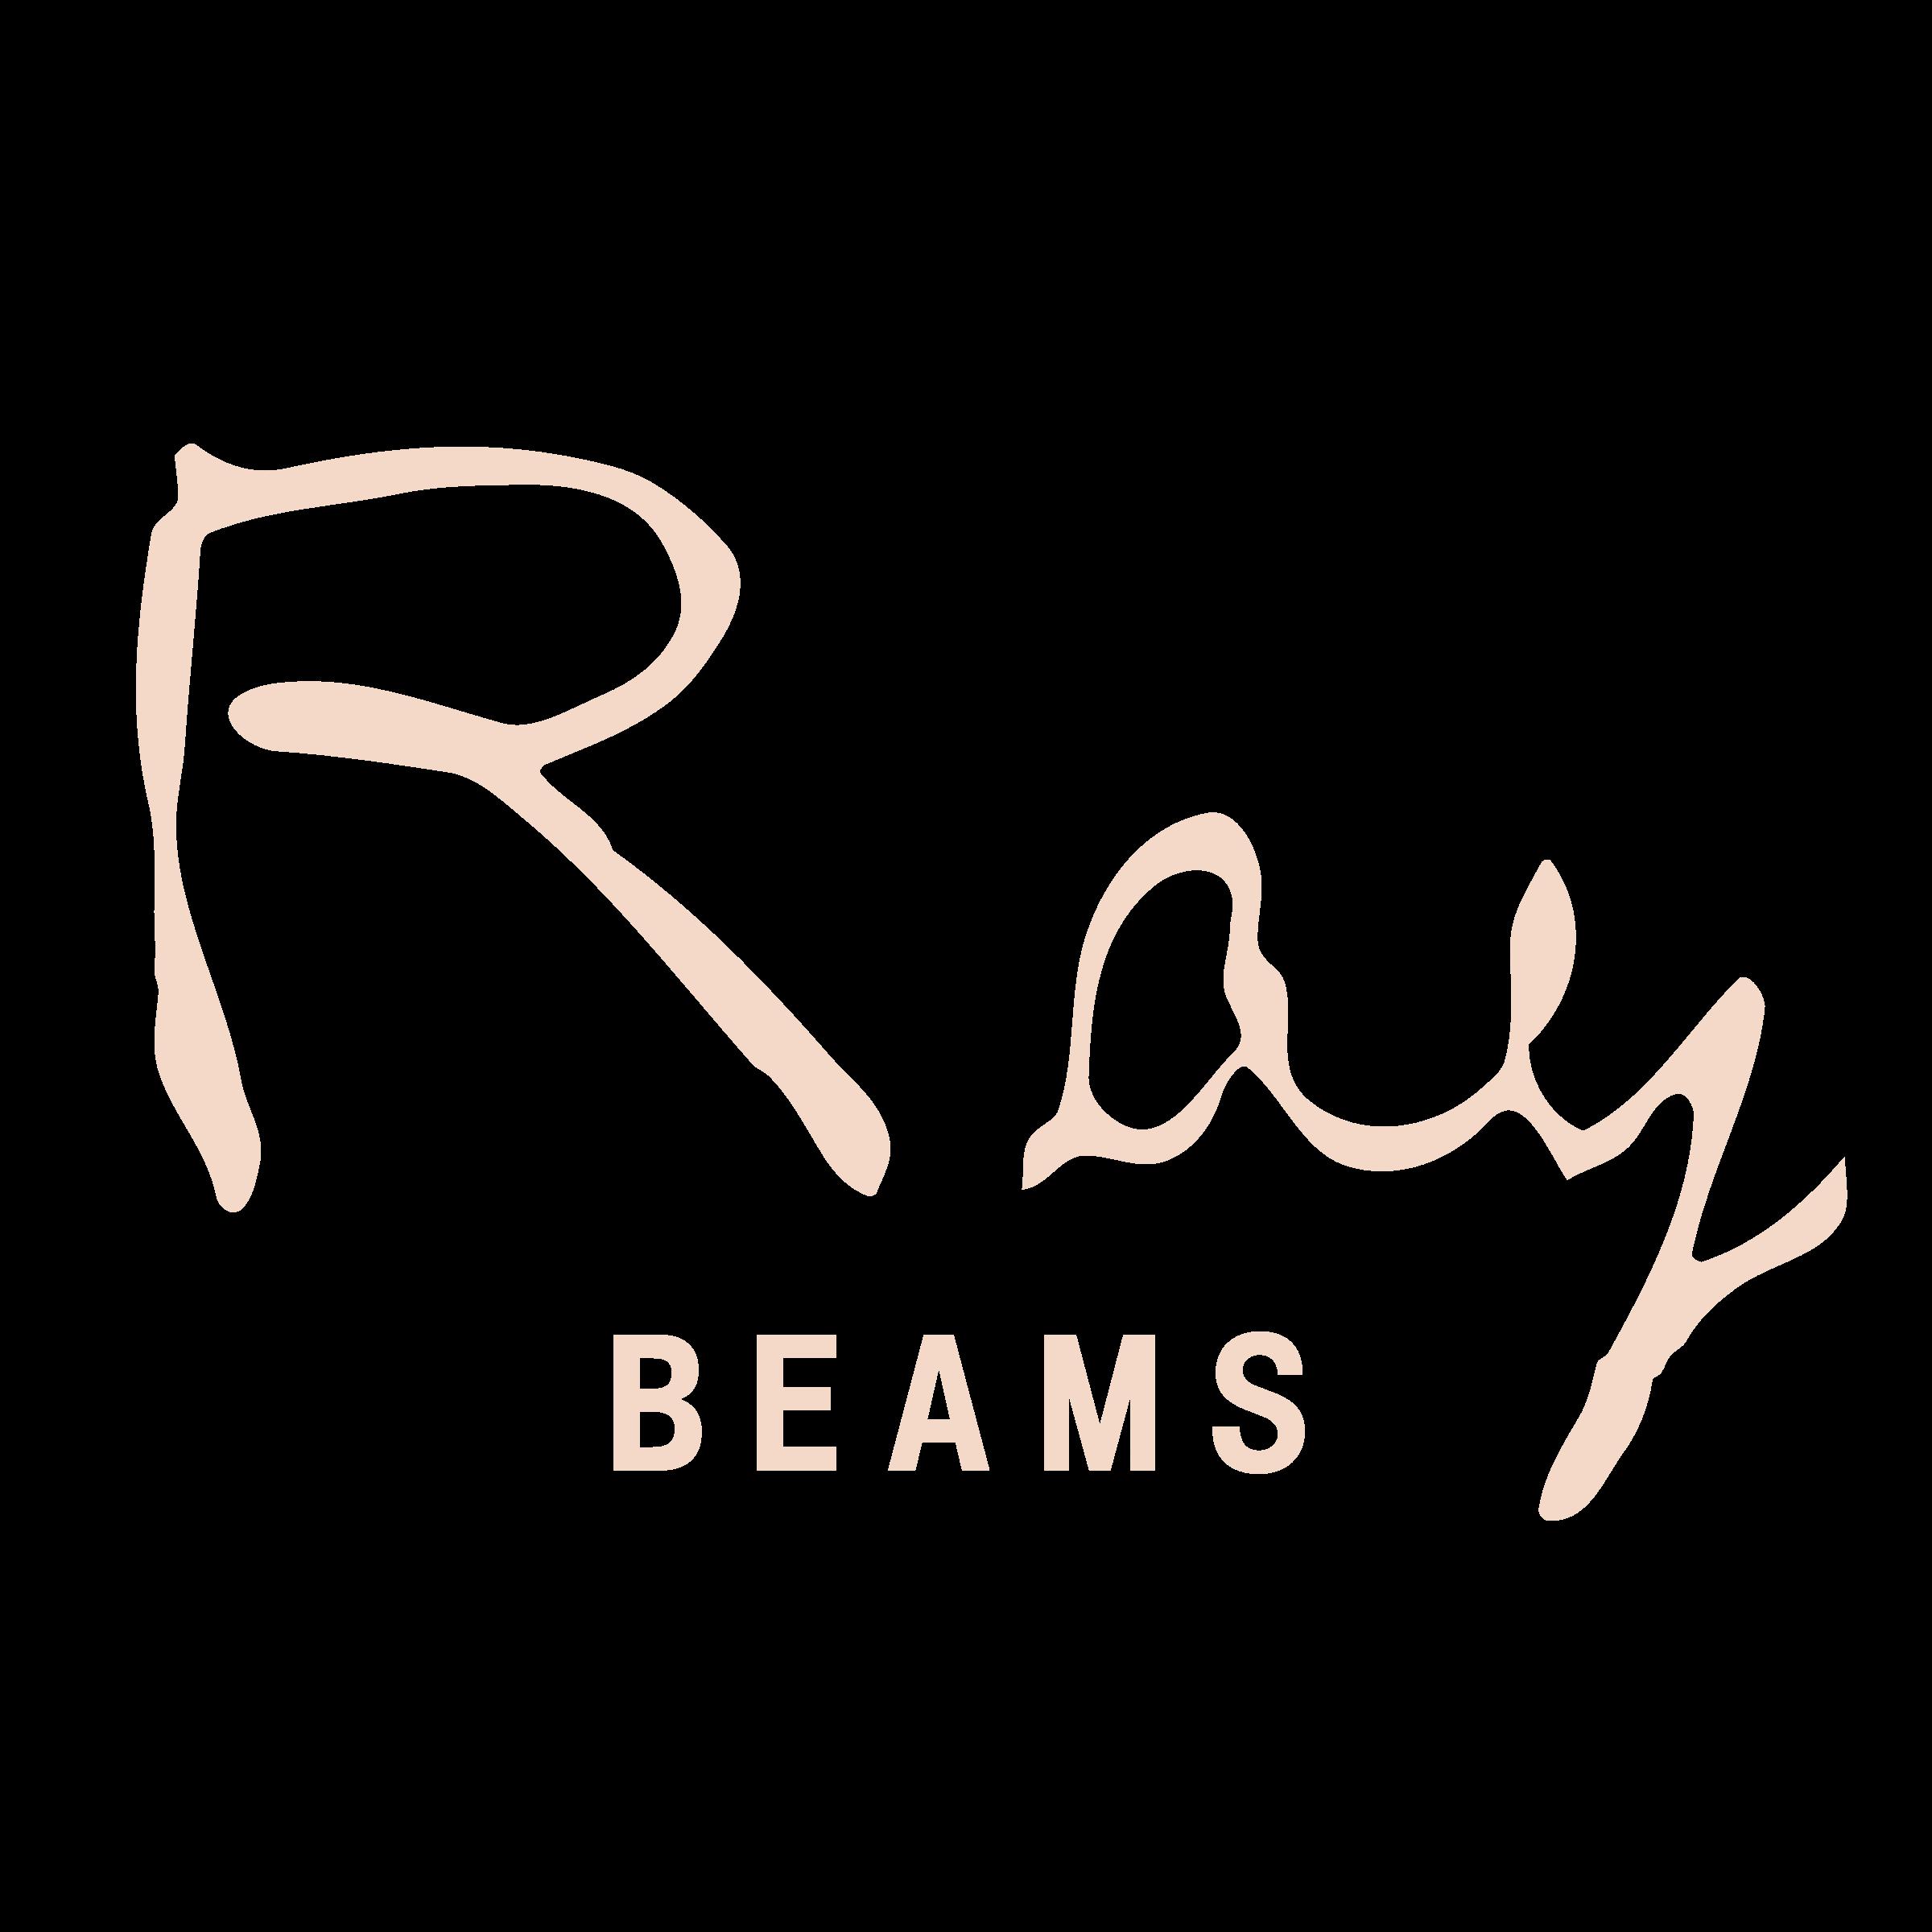 Ray Beams Logo PNG Transparent & SVG Vector - Freebie Supply